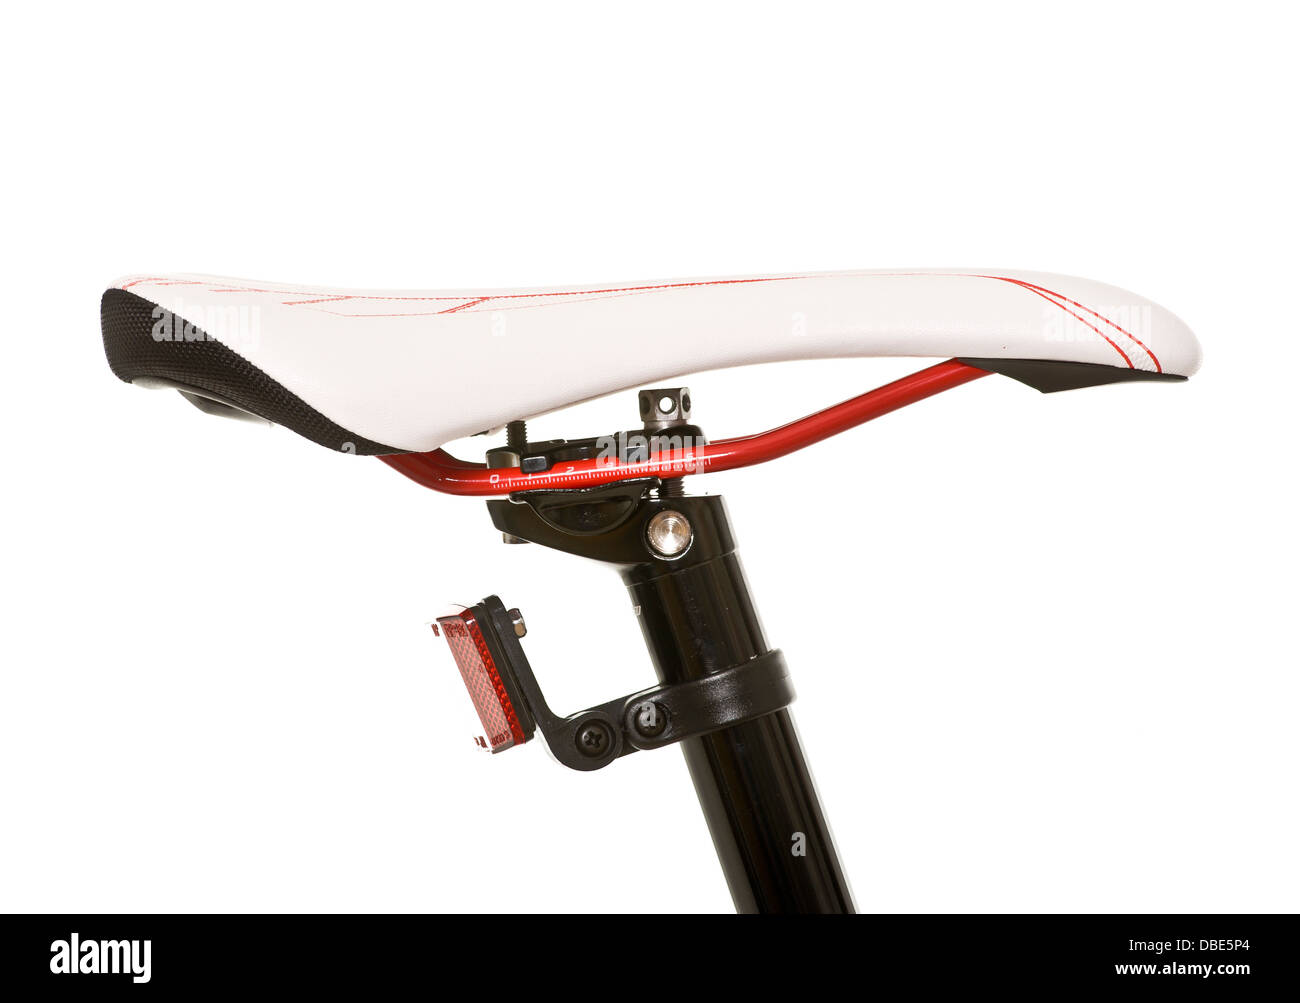 Mountain bike seat - Stock Image